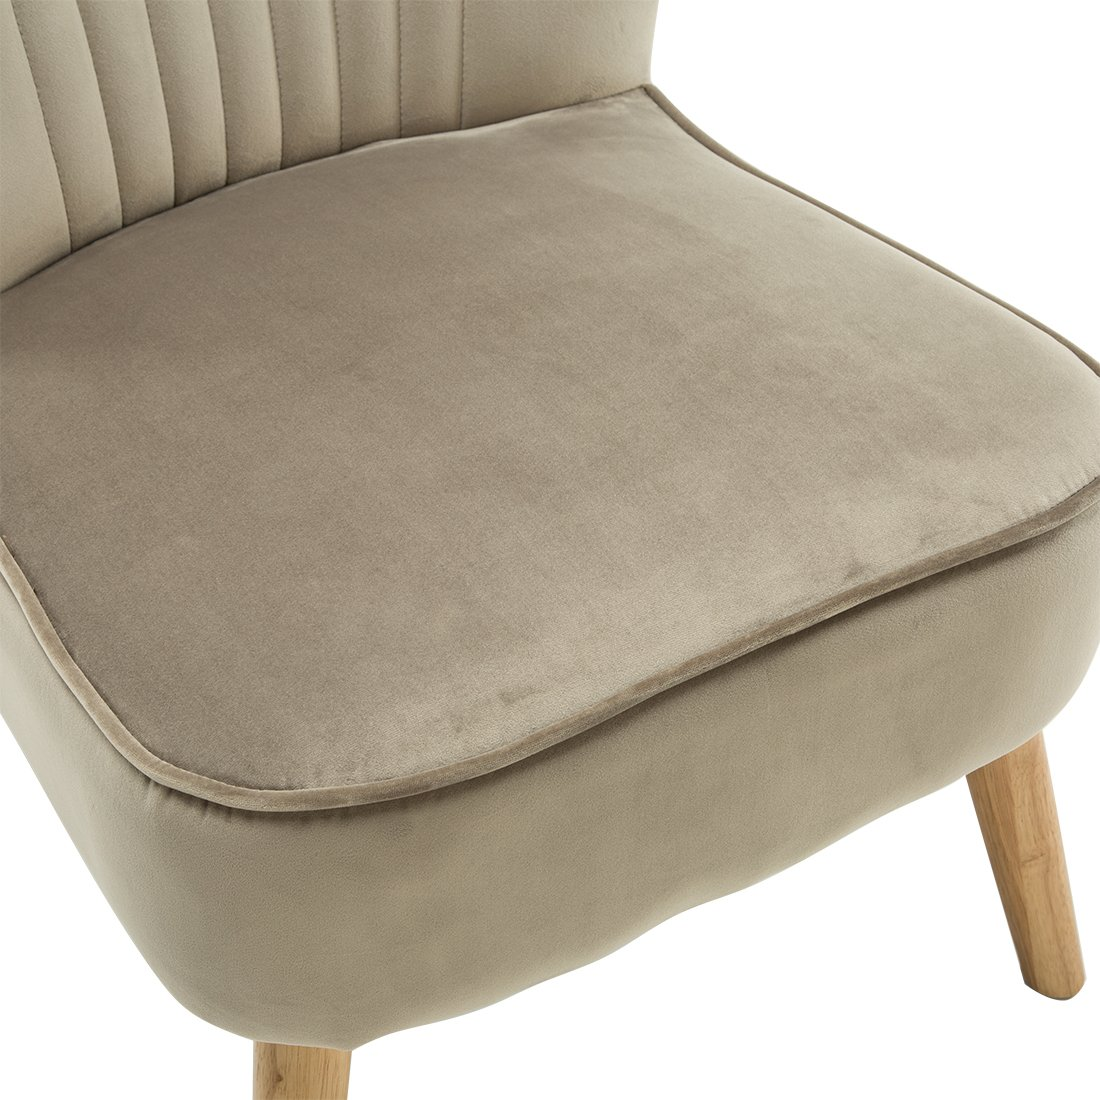 Lyssa Velvet Retro Occasional Bedroom Living Room Fabric Accent Chair Mink